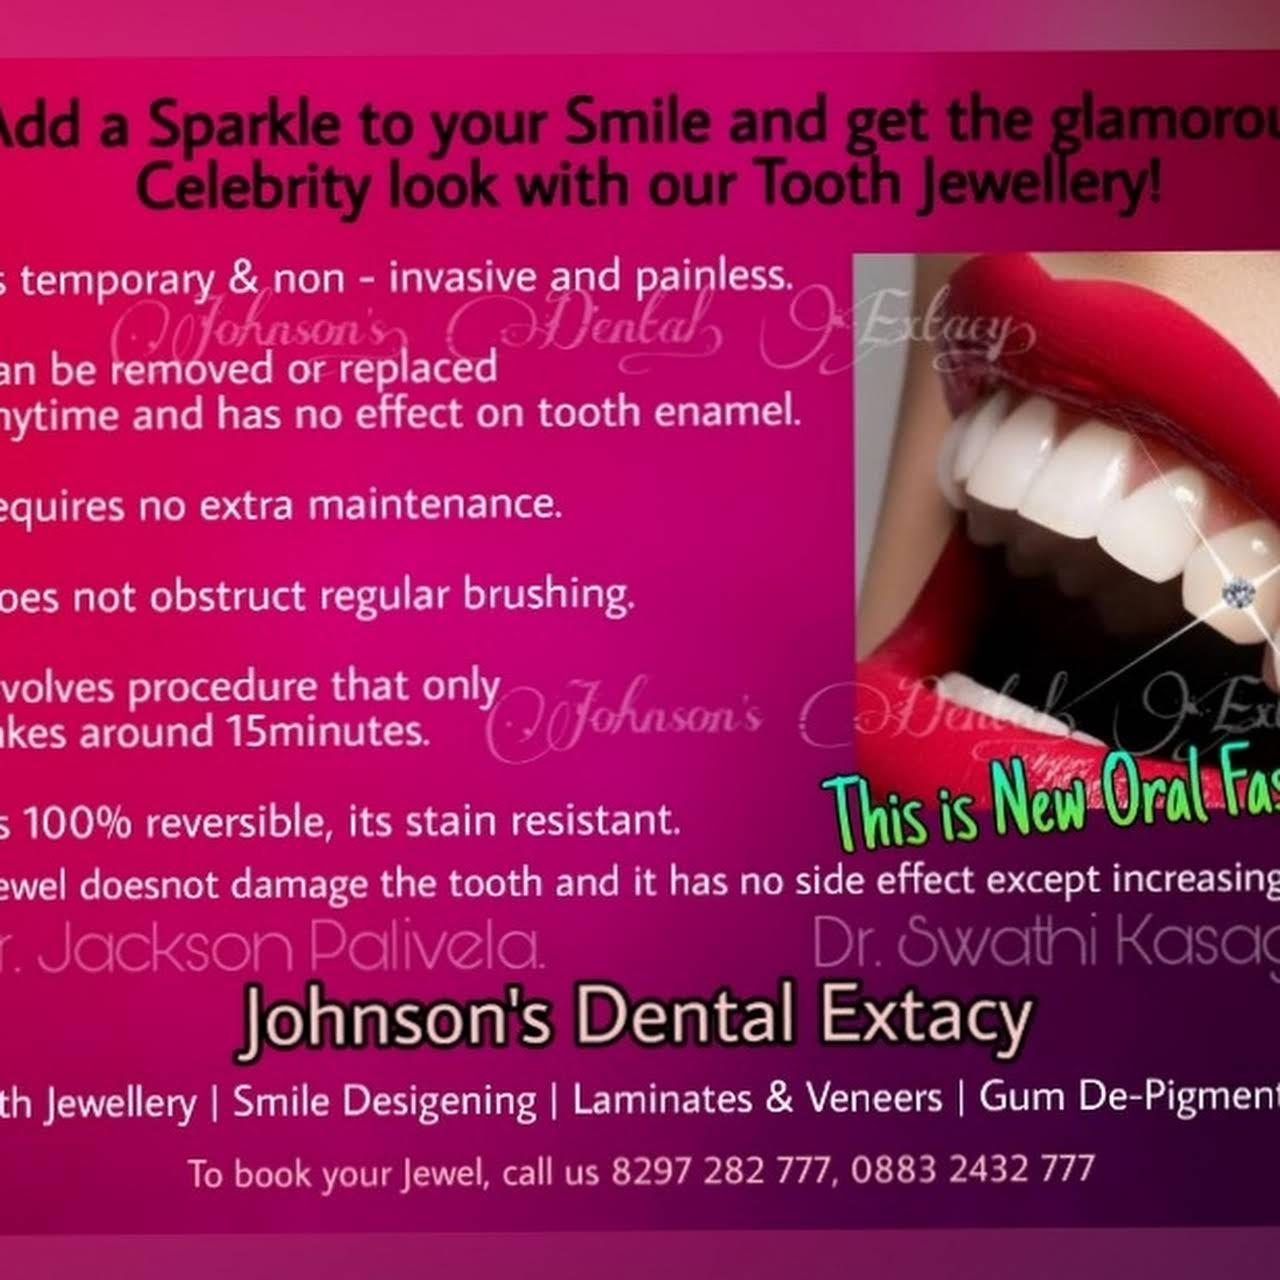 Johnson's Dental Extacy - World Class Dentalcare Solutions